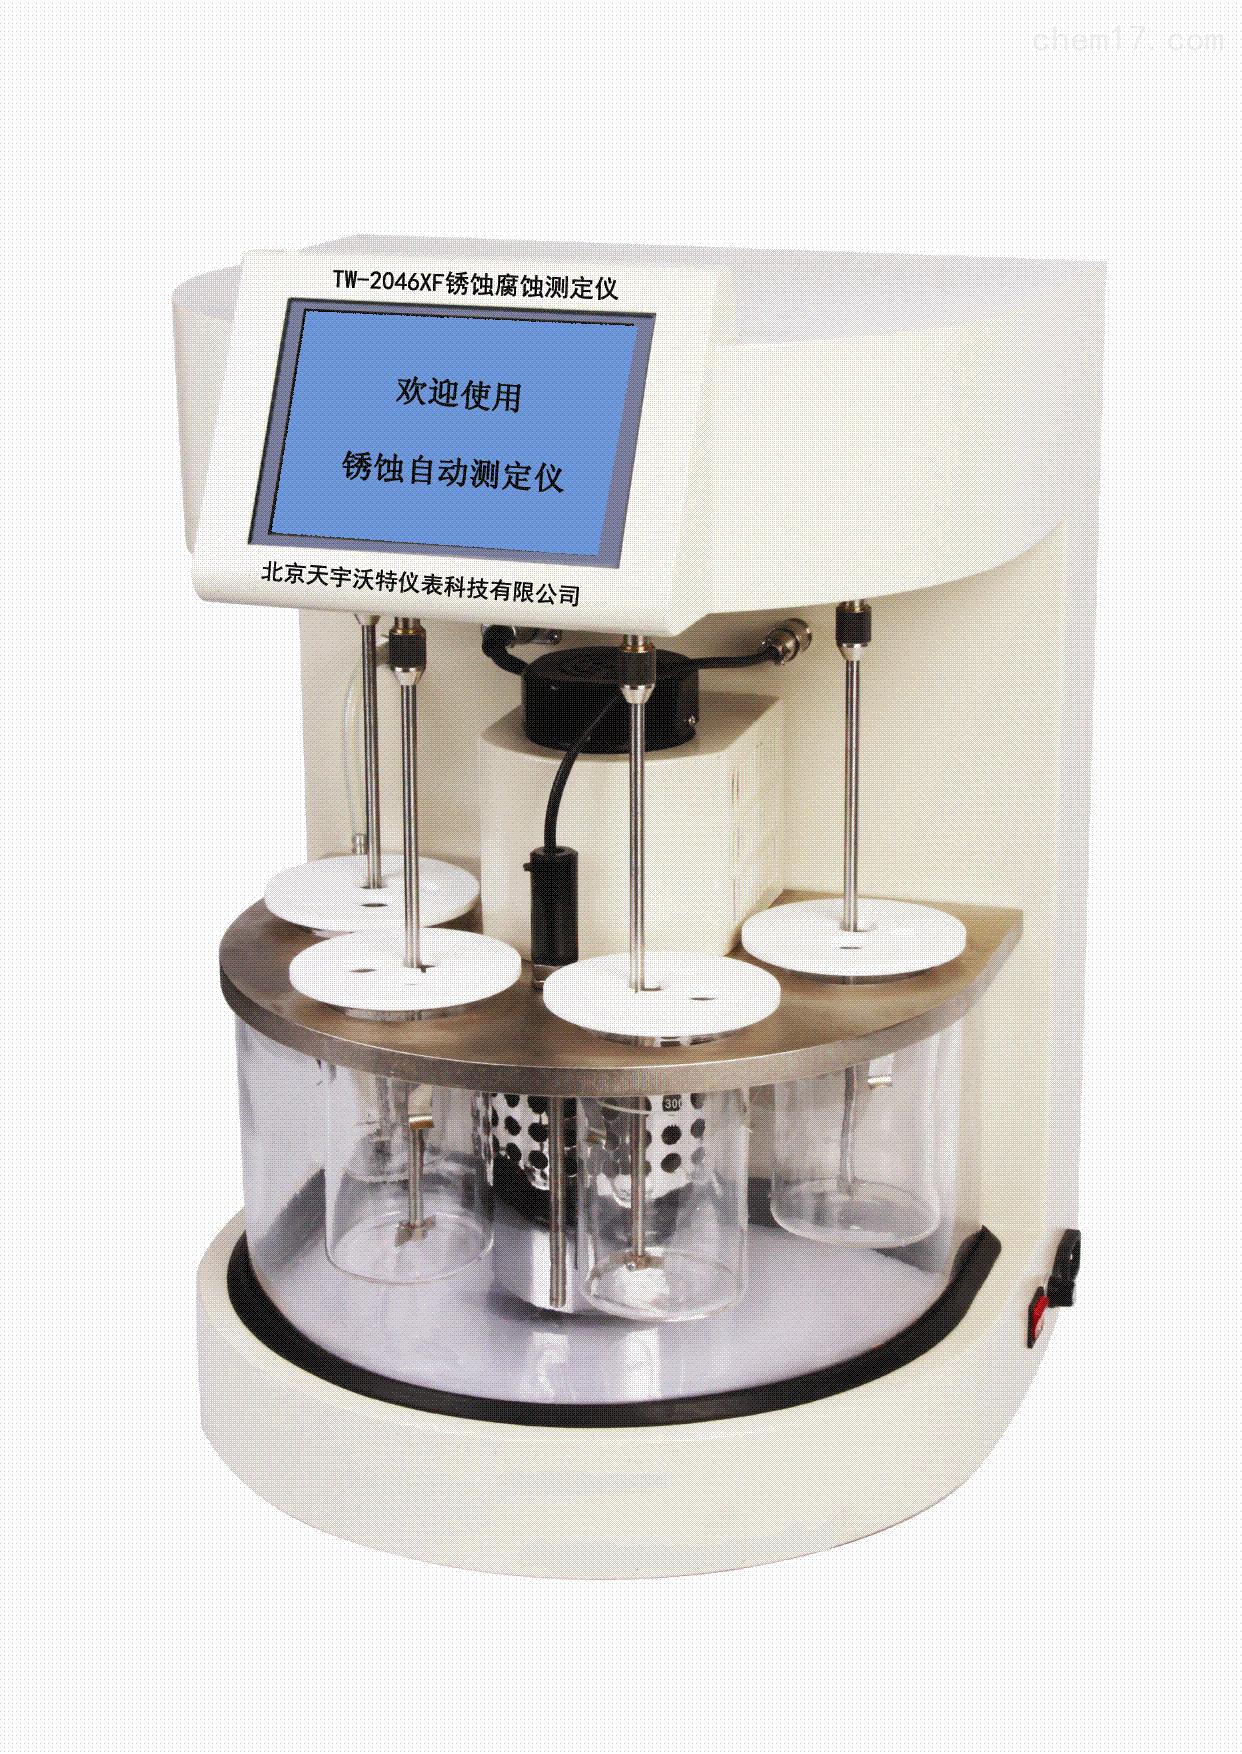 TW-2046XF锈蚀腐蚀测定仪